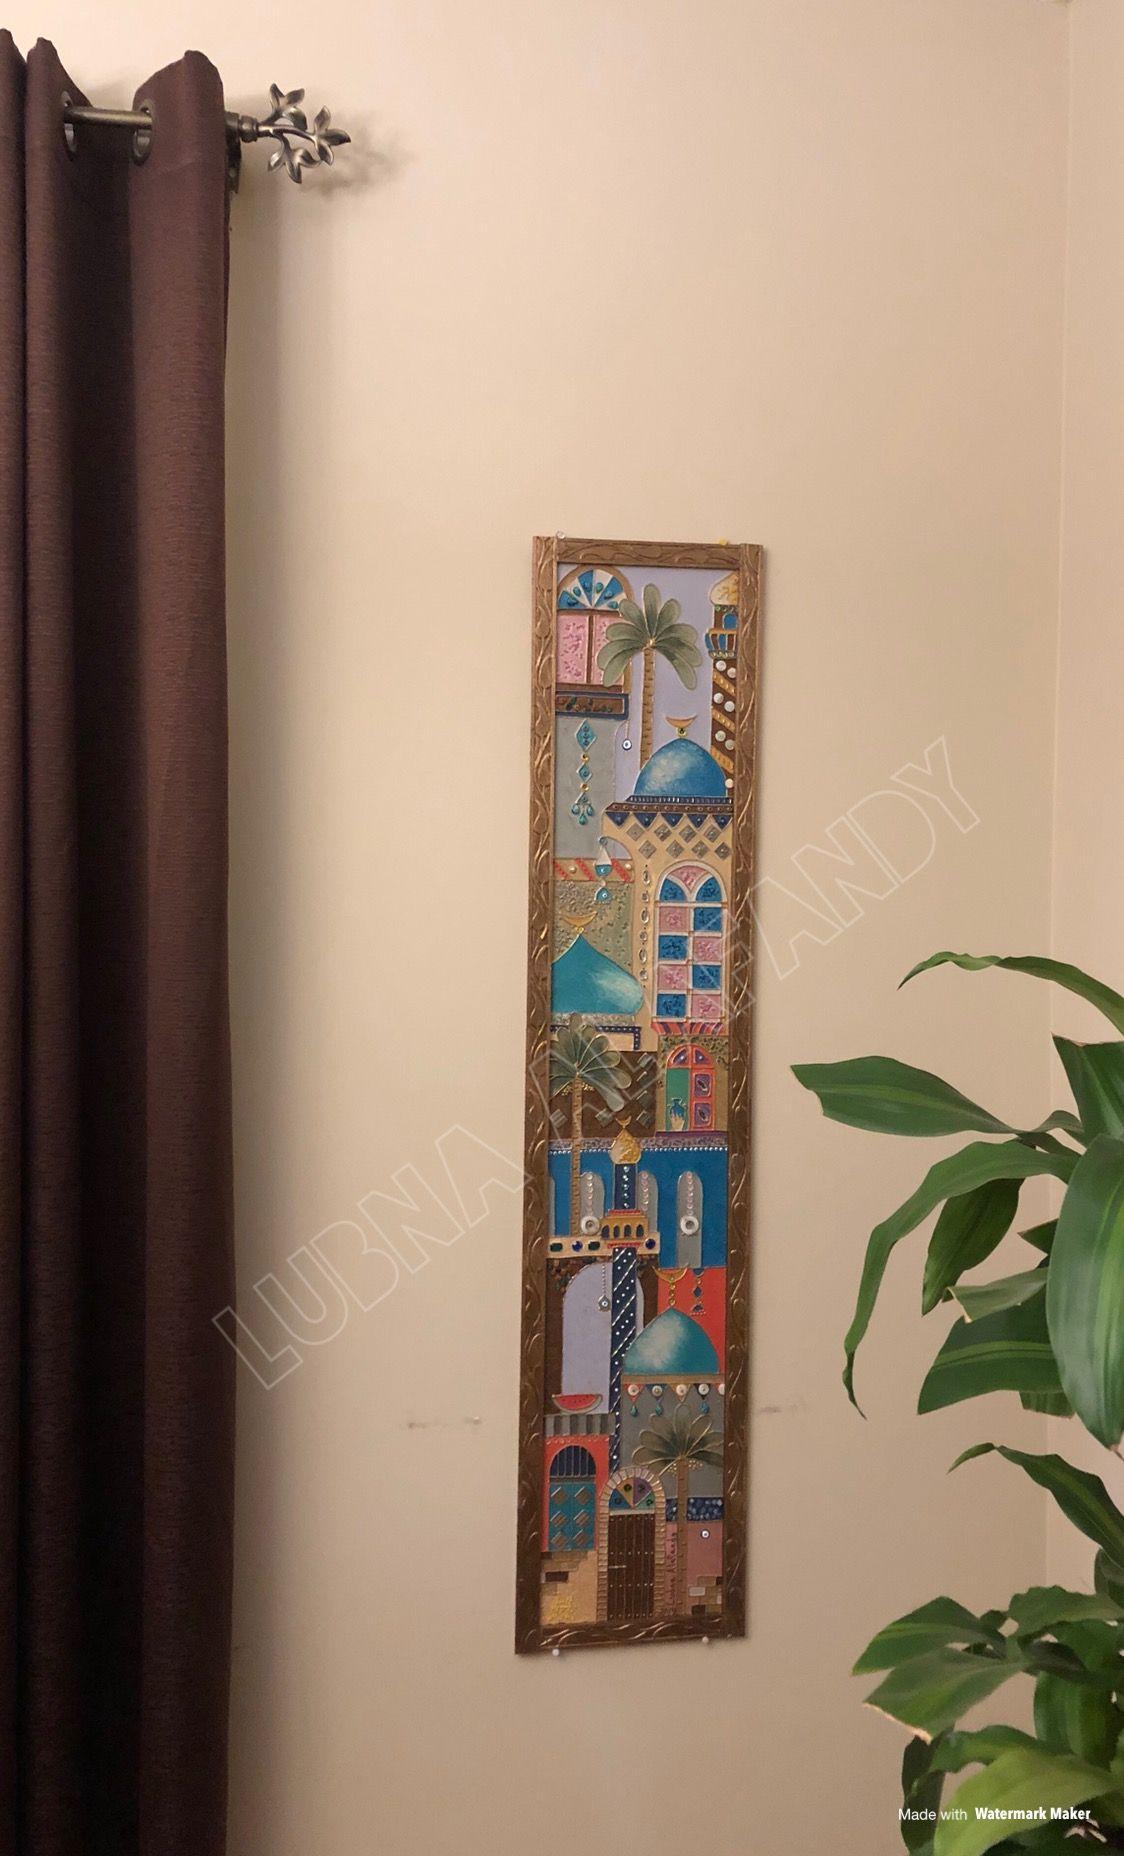 شناشيل لبنى الافندي Ceramic Wall Art Art Painting